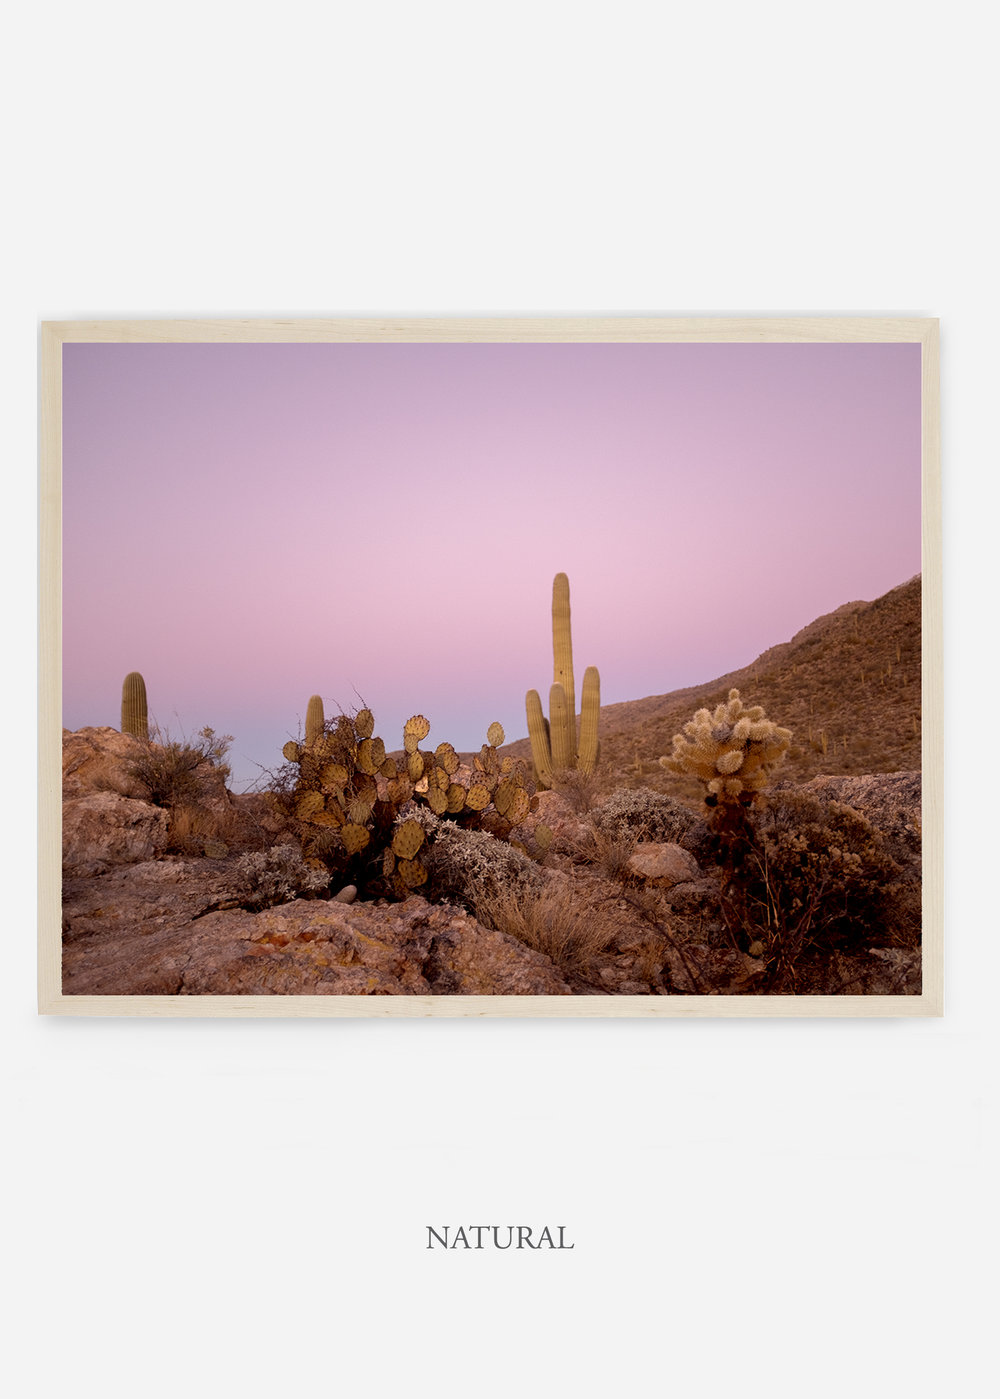 nomat_naturalframe-saguaroNo.9-wildercalifornia-art-wallart-cactusprint-homedecor-prints-arizona-botanical-artwork-interiordesign.jpg